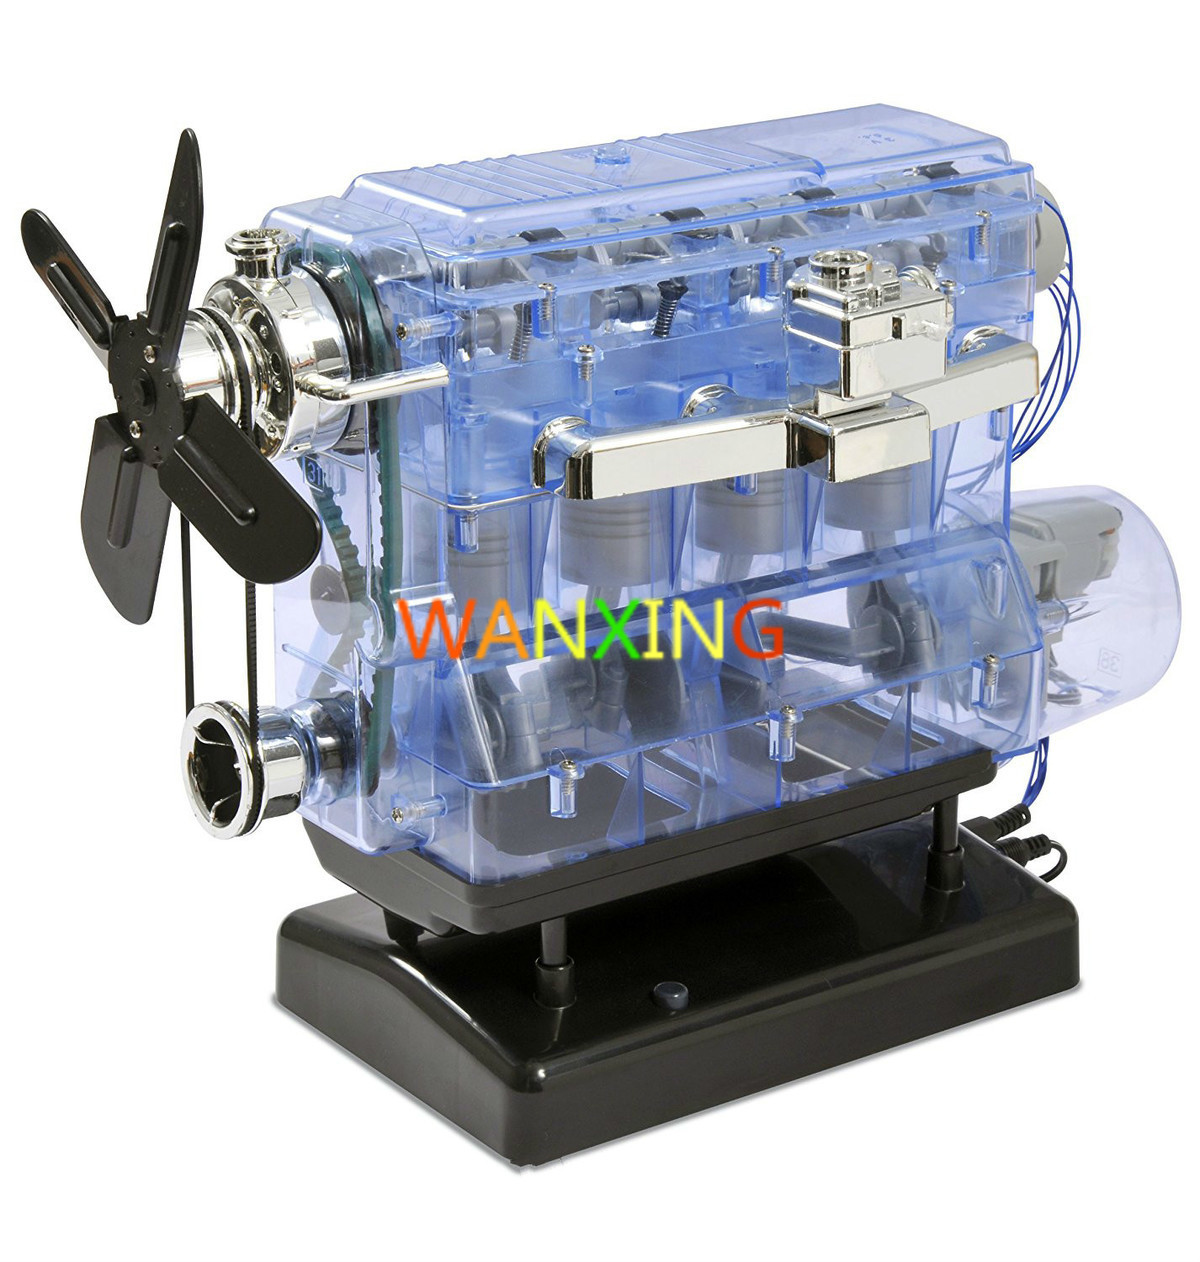 Engine Model Motor Drive Internal Combustion Engine Movable Engine Transparent Plastic Kit Physics Teaching Gift Hot Sale